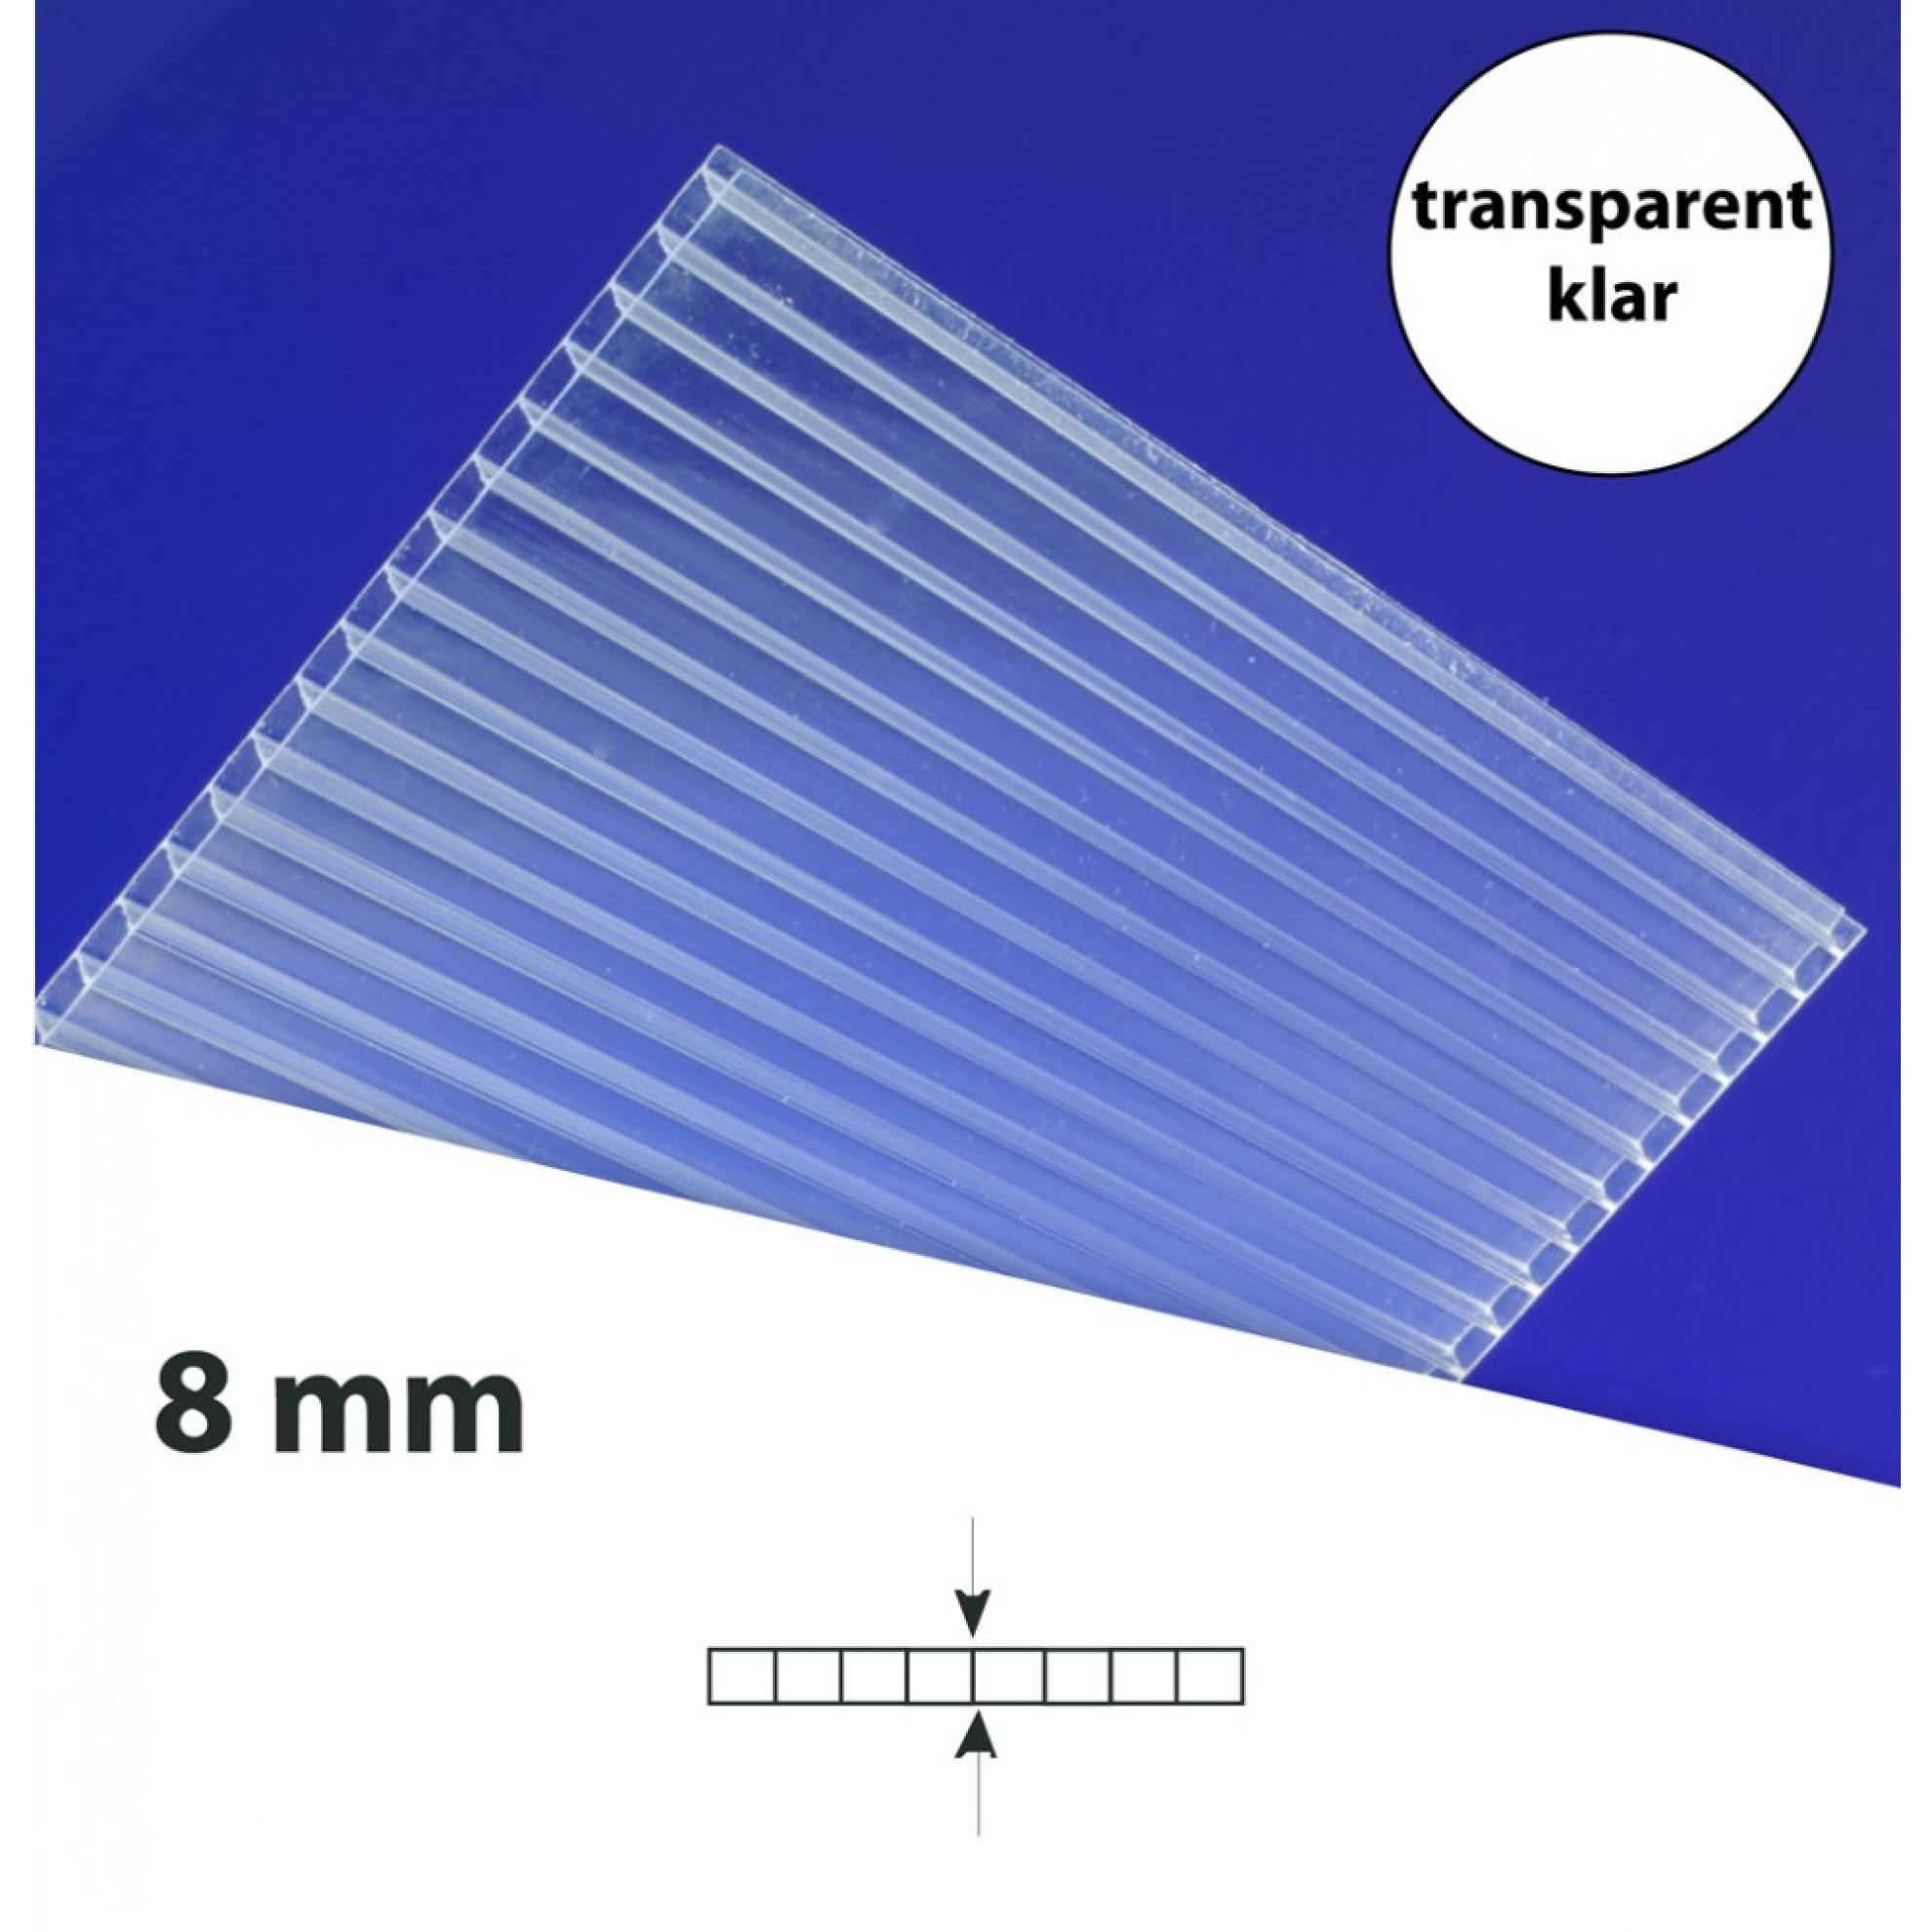 stegplatten 8 mm doppelstegplatten 8 mm. Black Bedroom Furniture Sets. Home Design Ideas